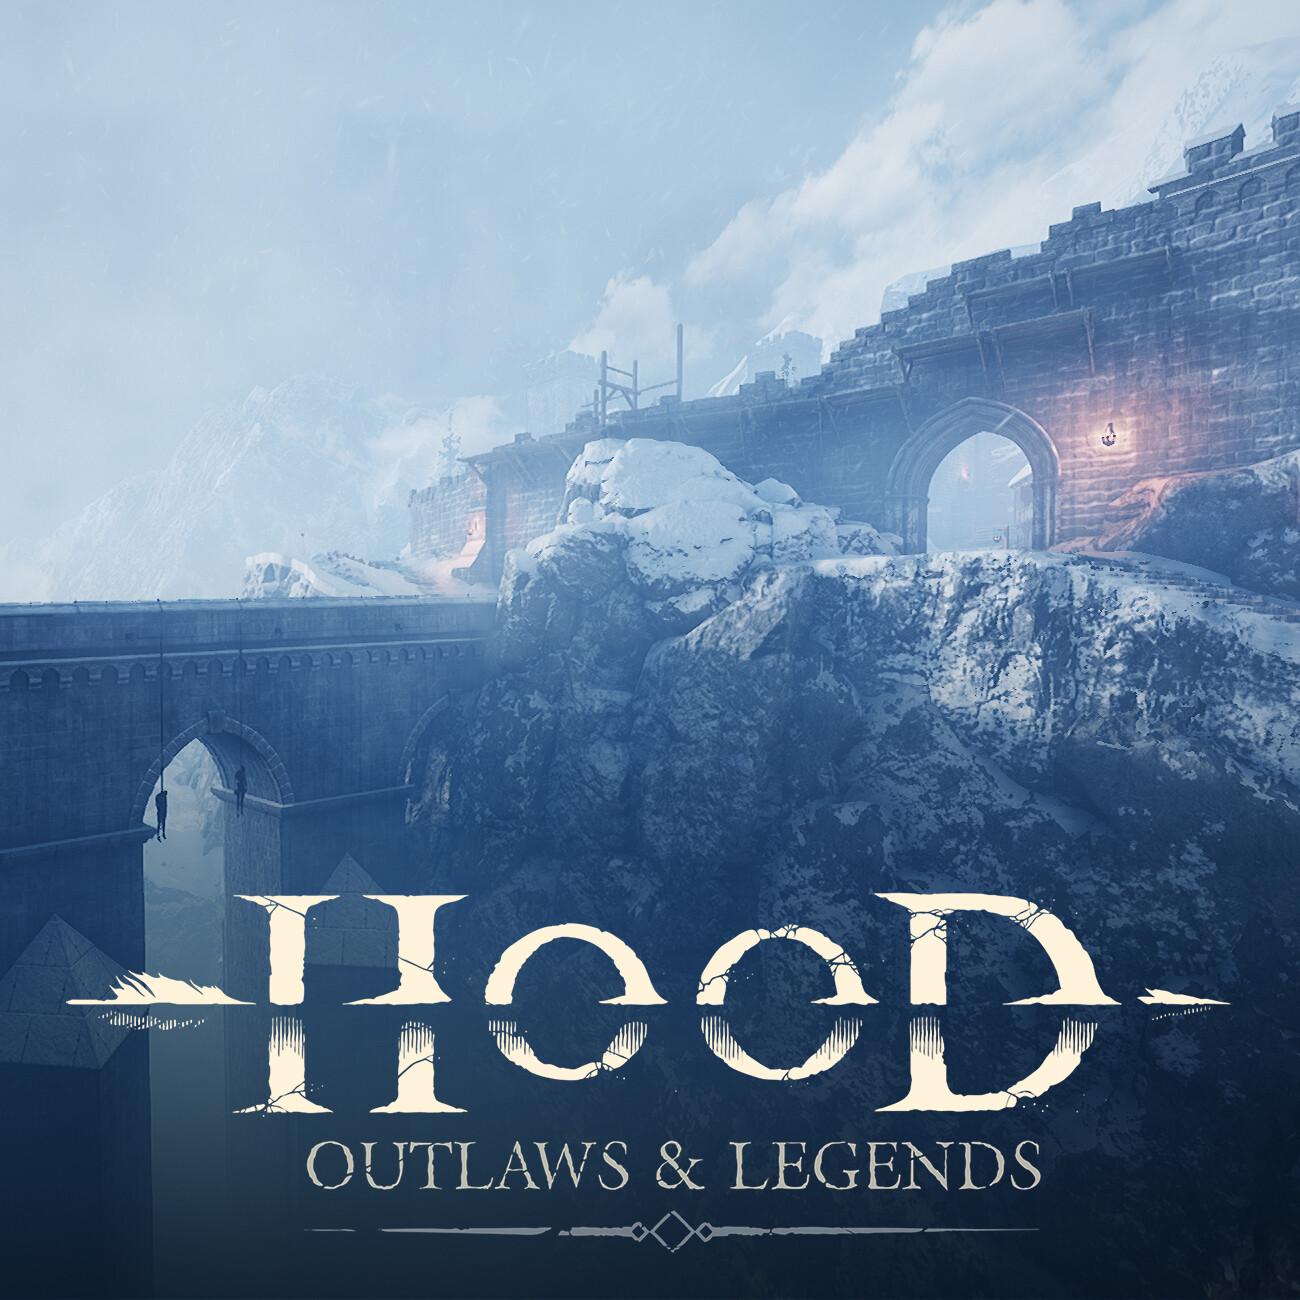 Hood: Outlaws & Legends - Mountain Lighting